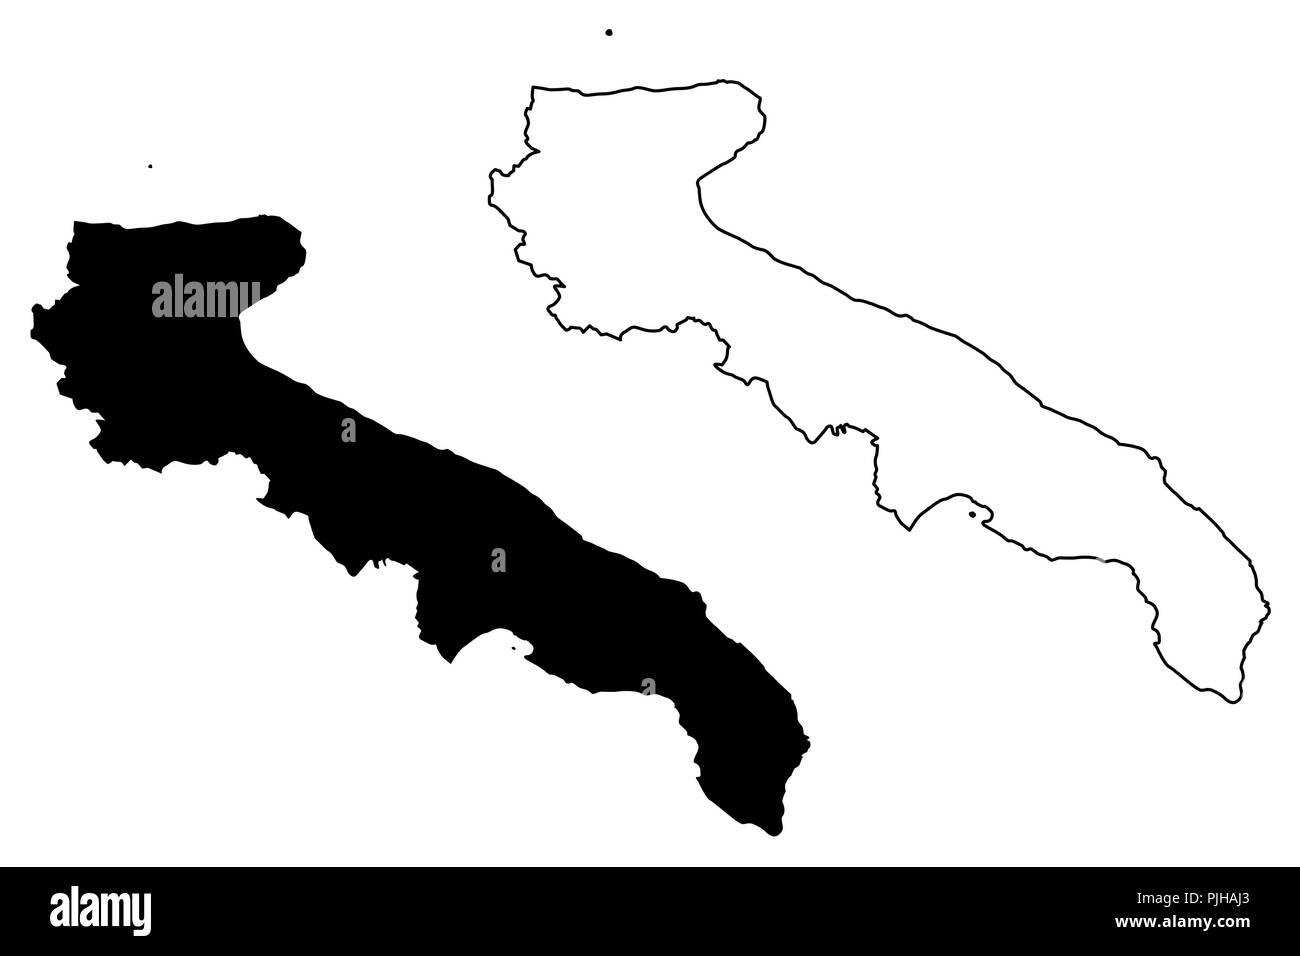 Apulien Autonome Region Italiens Karte Vektor Illustration